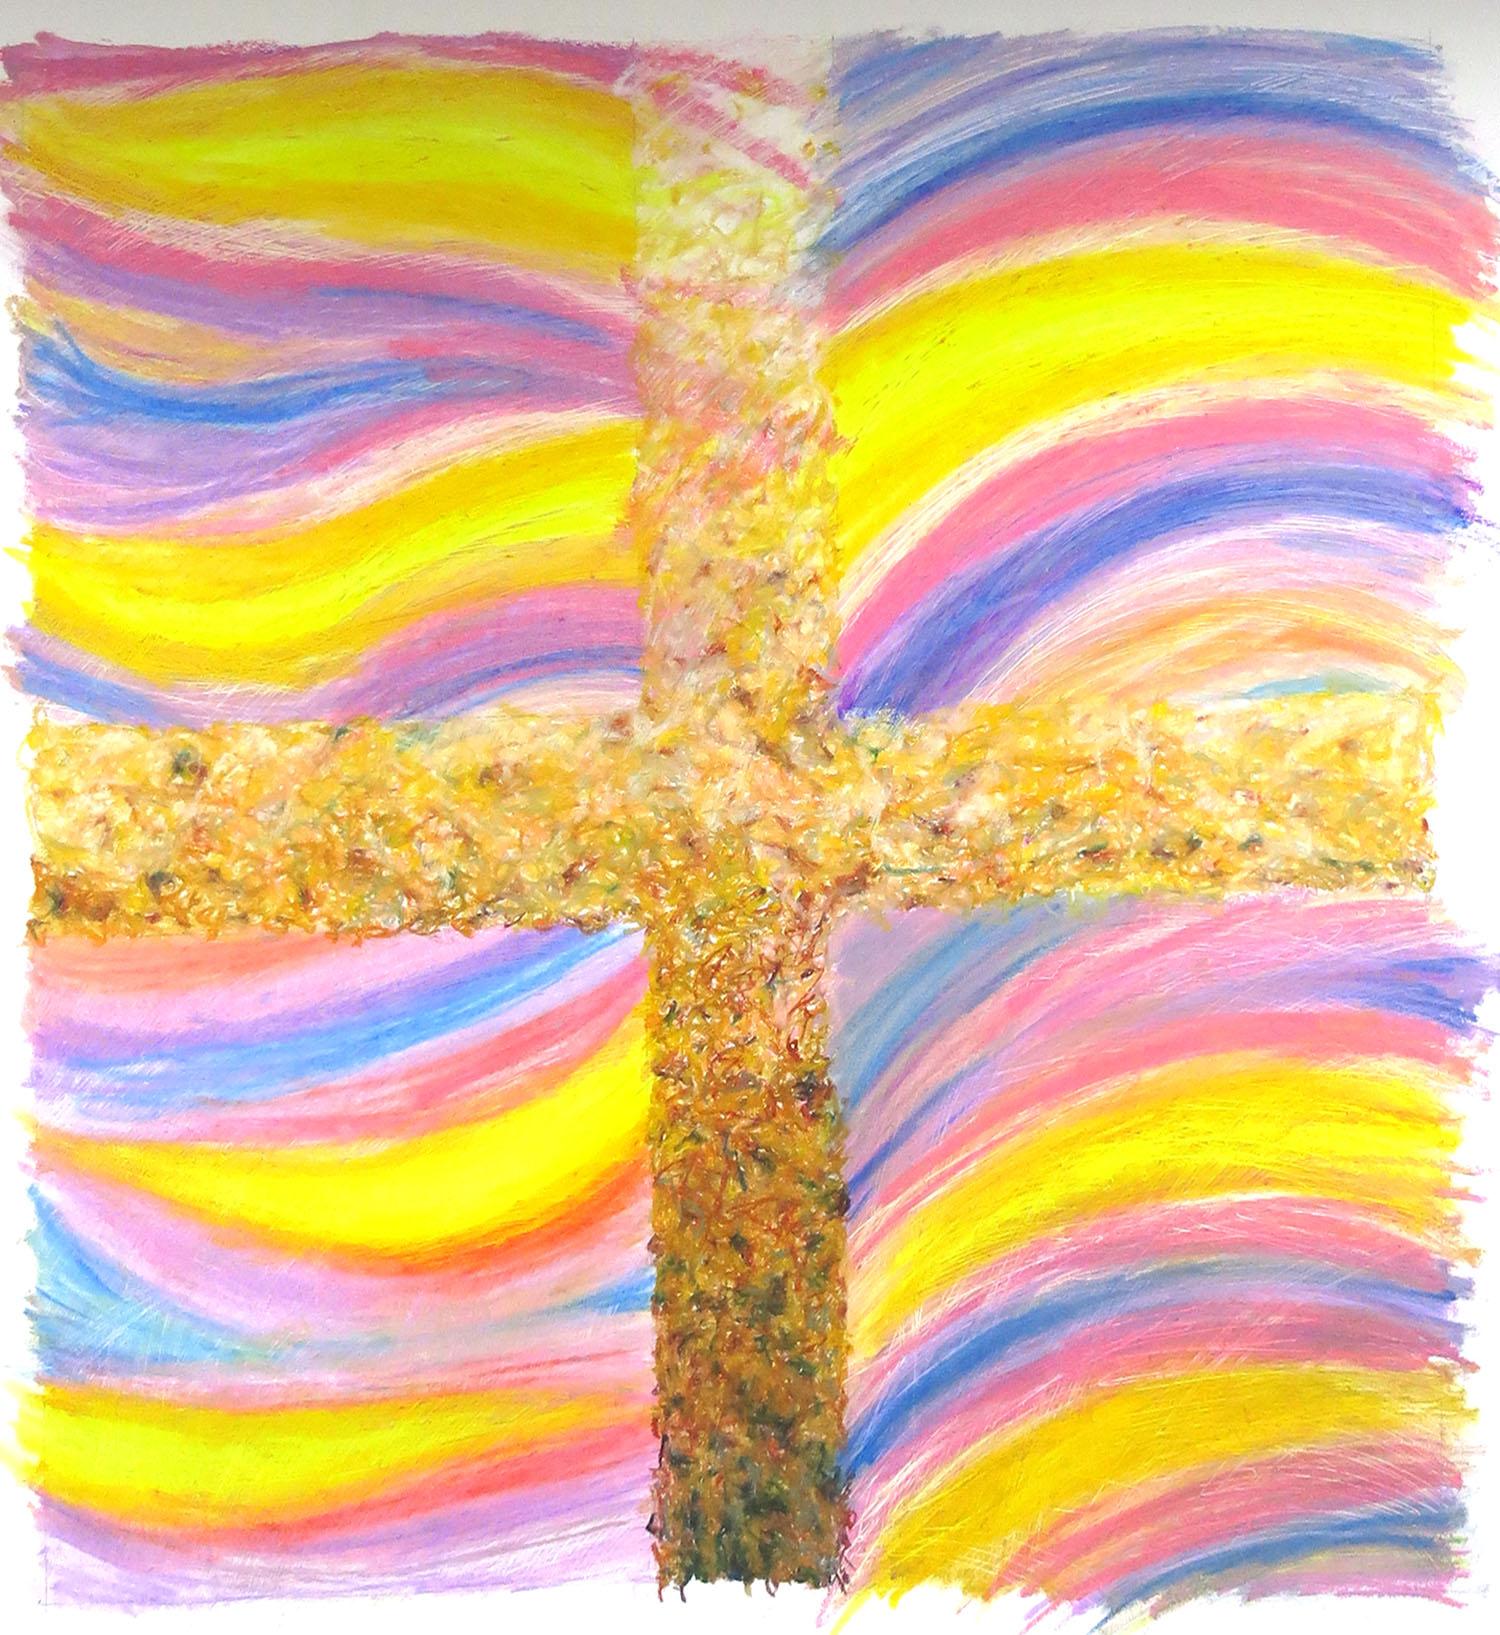 Oil pastel on Bockingford 36 inches square